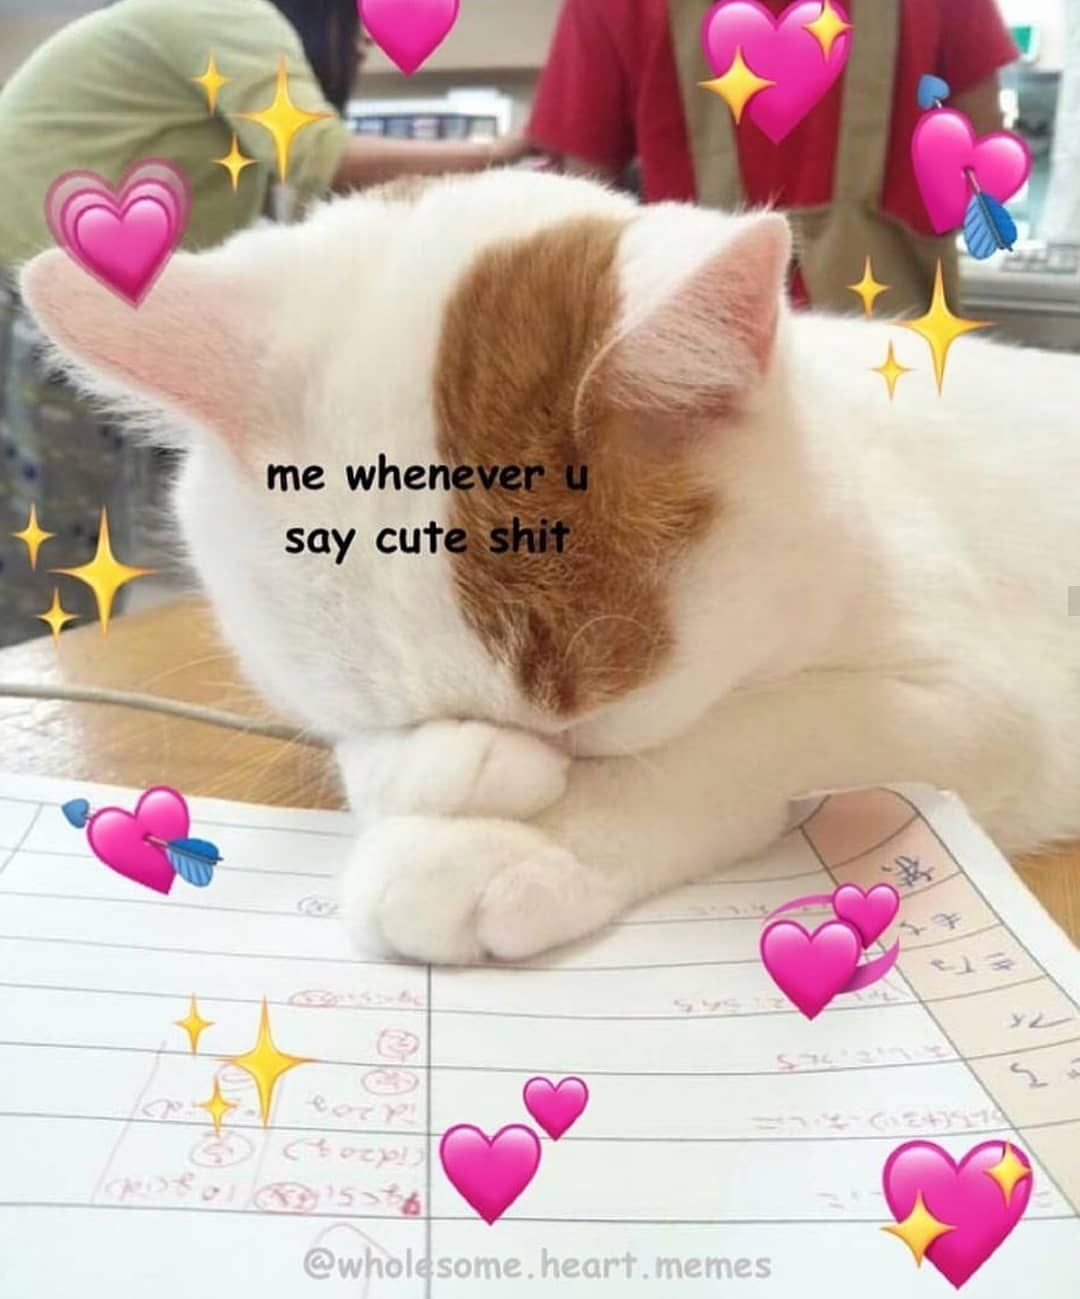 Cat Hearts Meme : hearts, Someone, Special, #wholesome, #wholesomememe, Hearts, #love, #meme, #softmeme, #cute, #cutememe, #p…, Meme,, Memes,, Memes